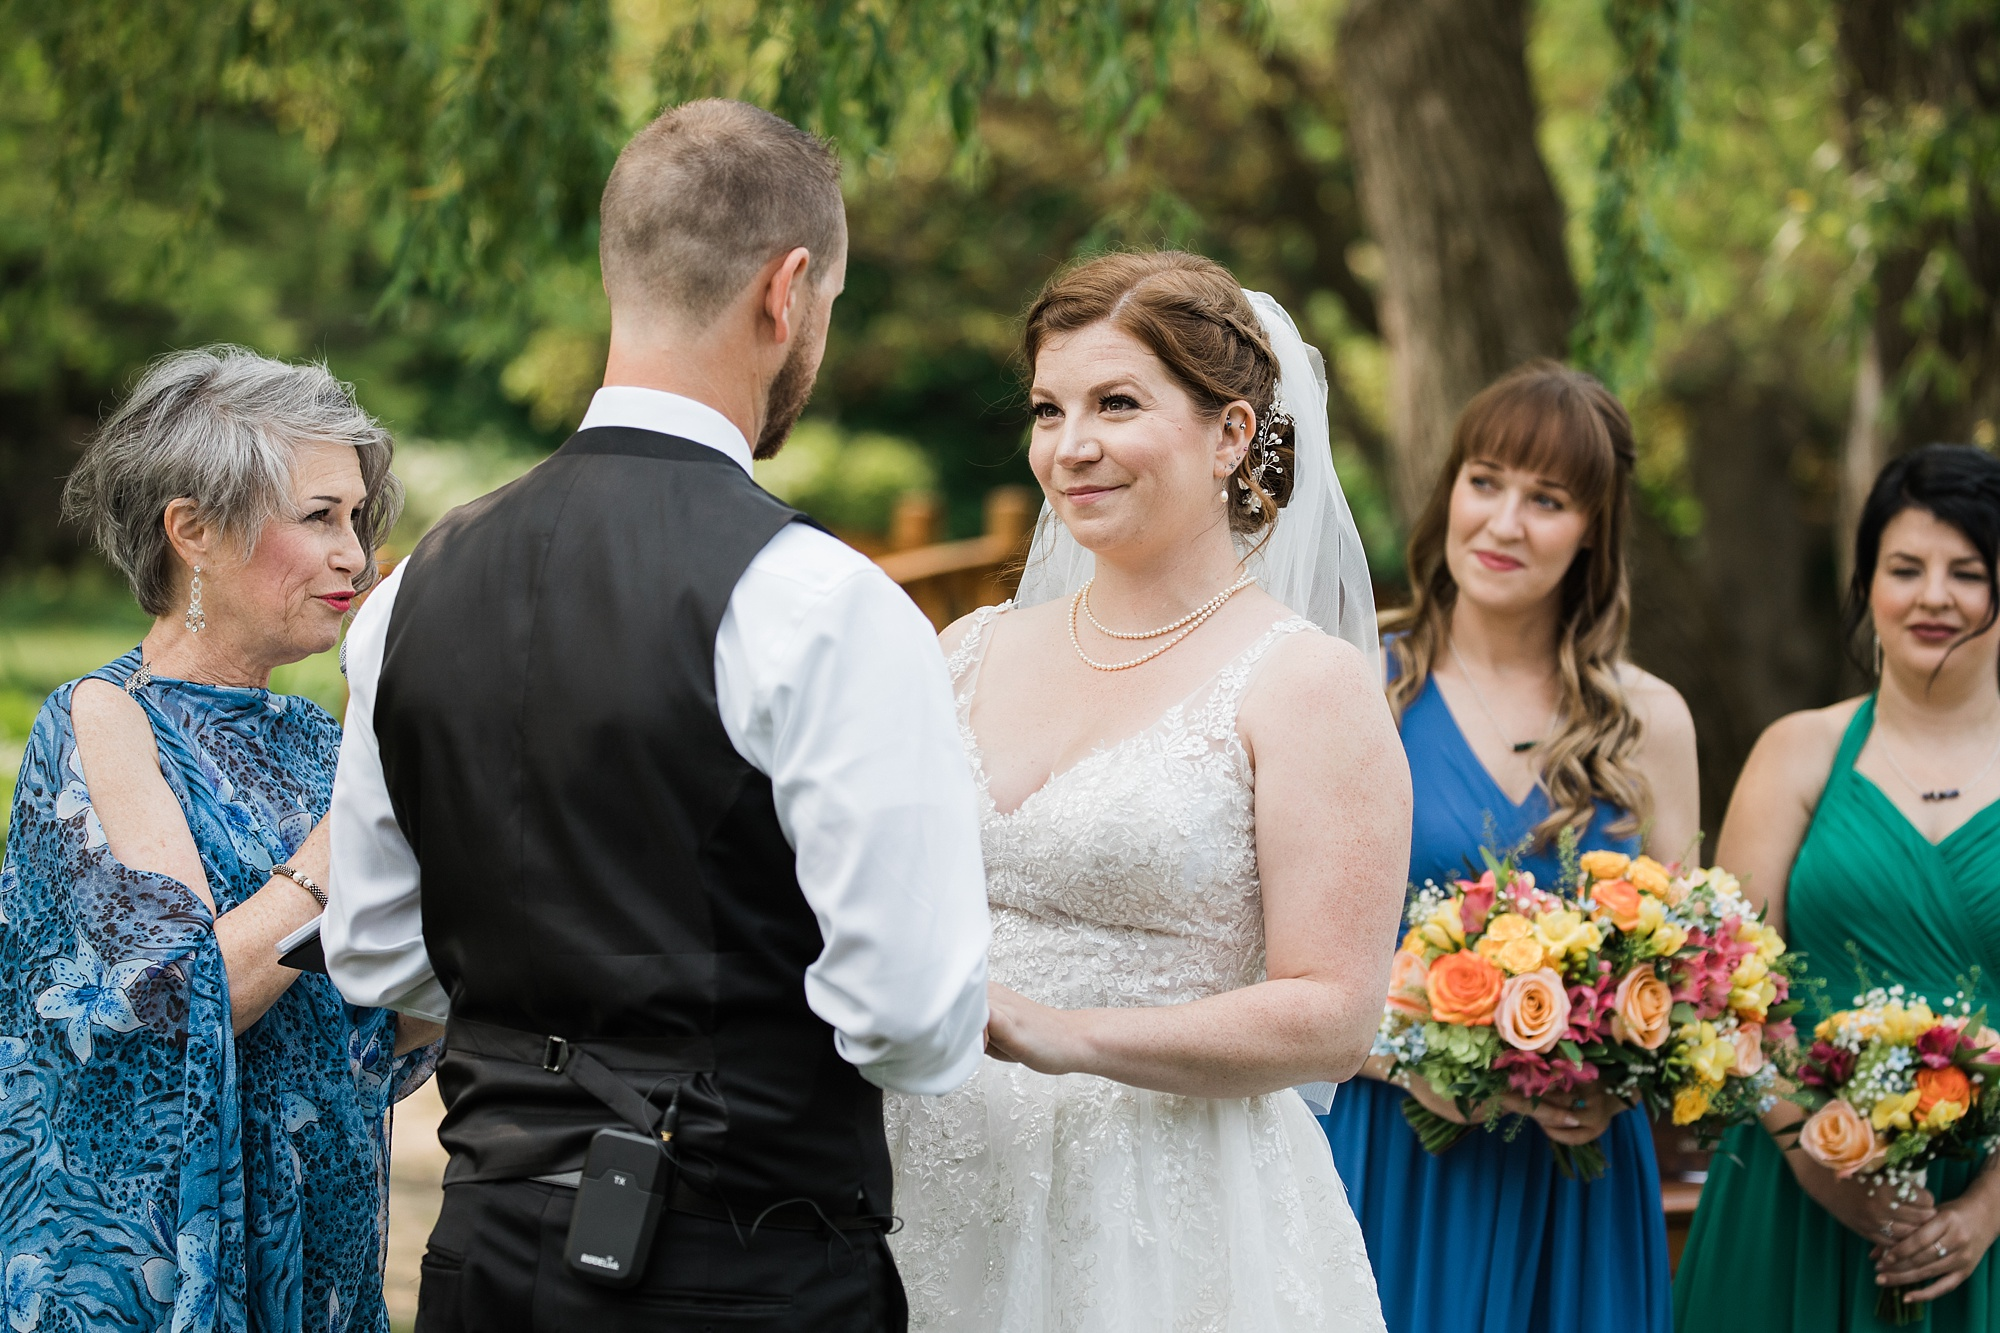 niagarafalls-weddingphotography_0020.jpg